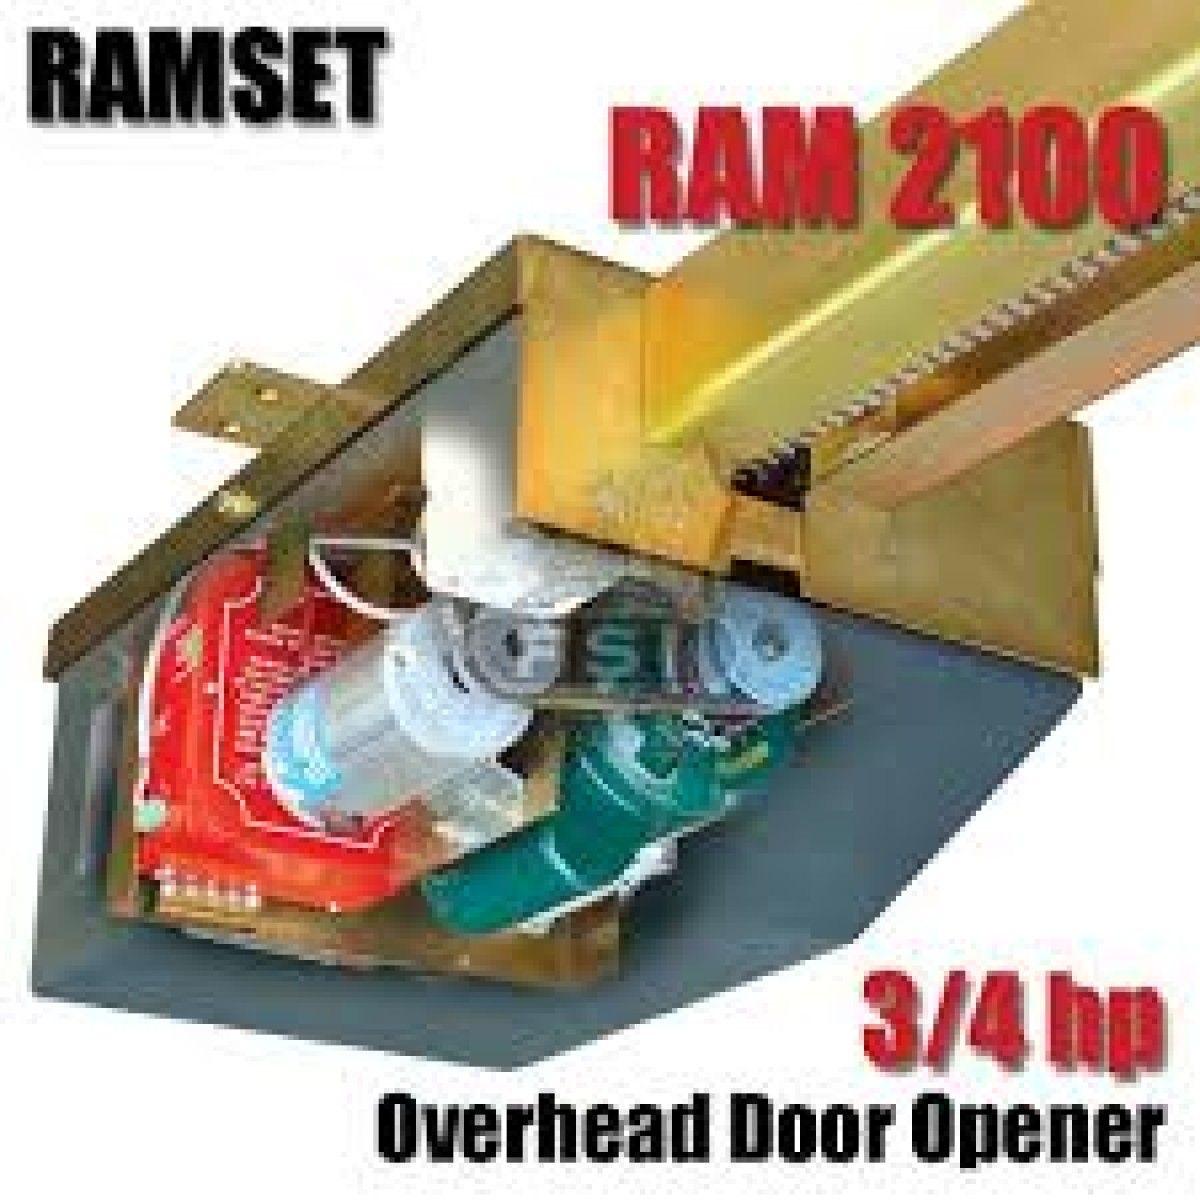 Ramset Ram 2100 Gate Operator 3 4 Hp Overhead Gate Operator In 2020 Gate Operators Gate Openers Gate